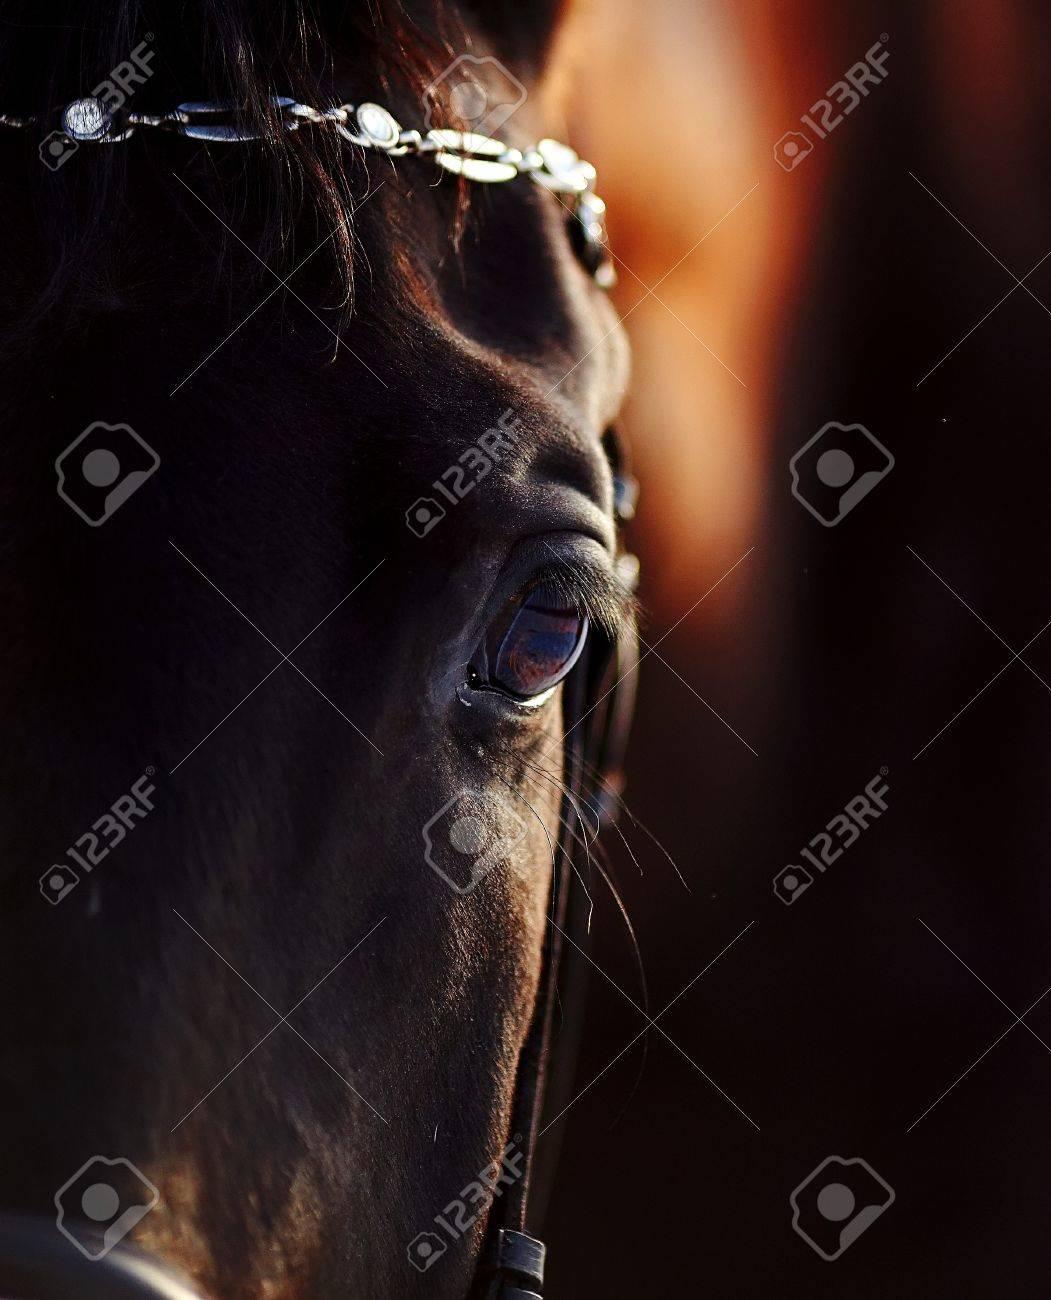 Eye of a horse. Portrait of a horse. Sports horse. Thoroughbred stallion. Muzzle of a horse. Saddle horse. Stock Photo - 17968032